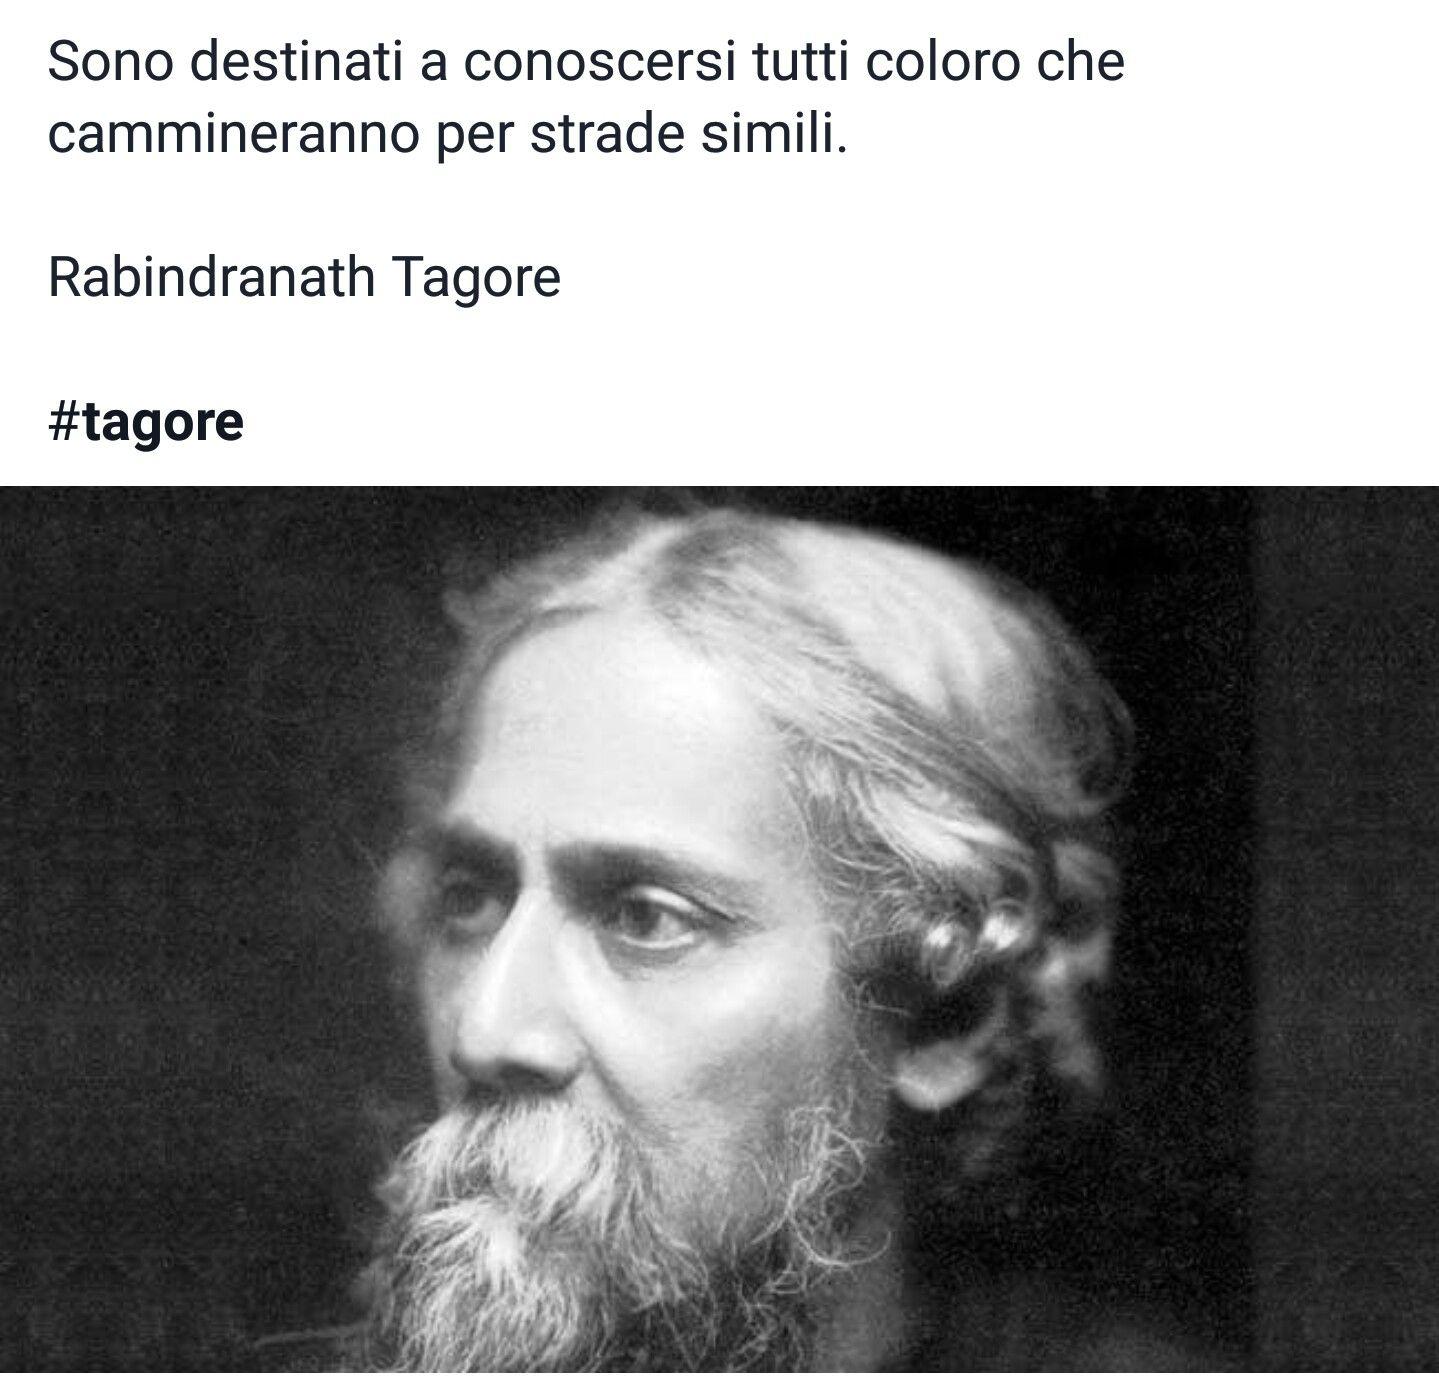 rabindranath tagore frasi celebri rabindranath tagore rabindranath tagore